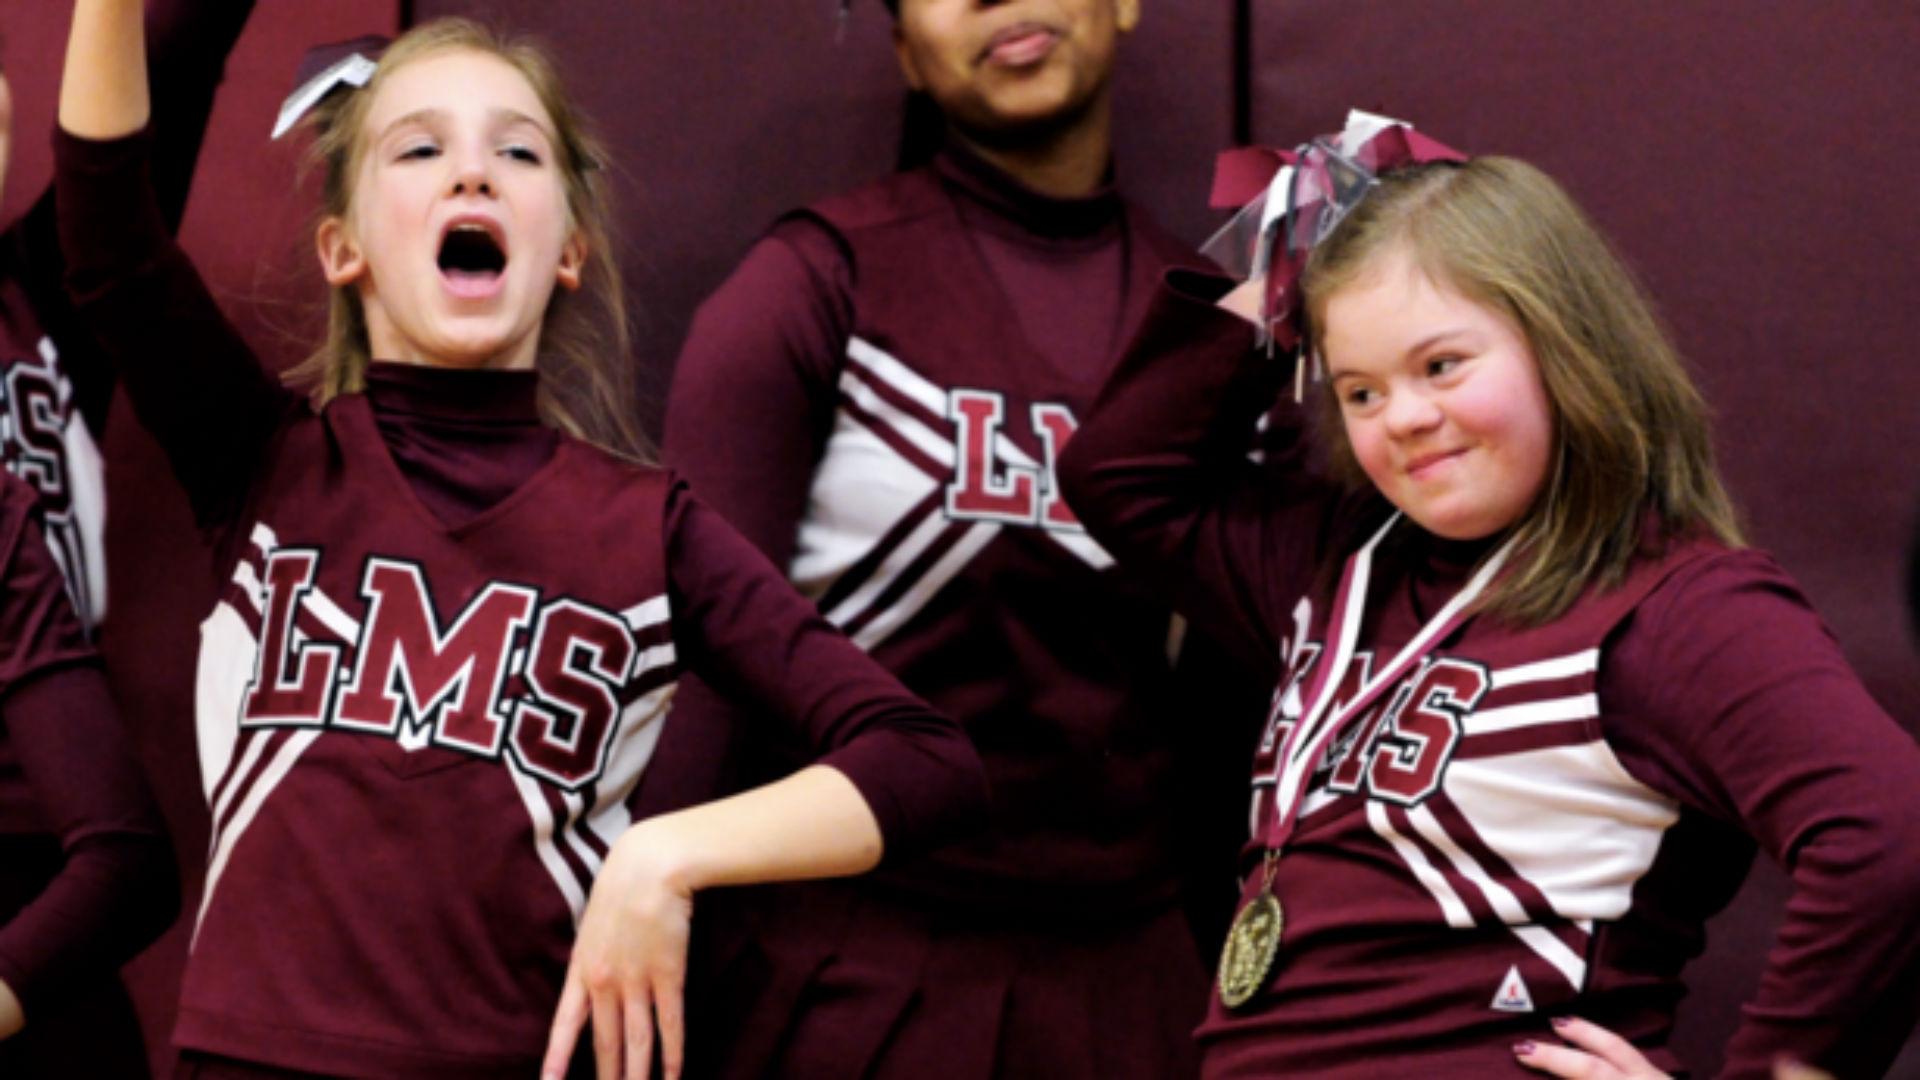 cheerleader-ftr-03121.jpg